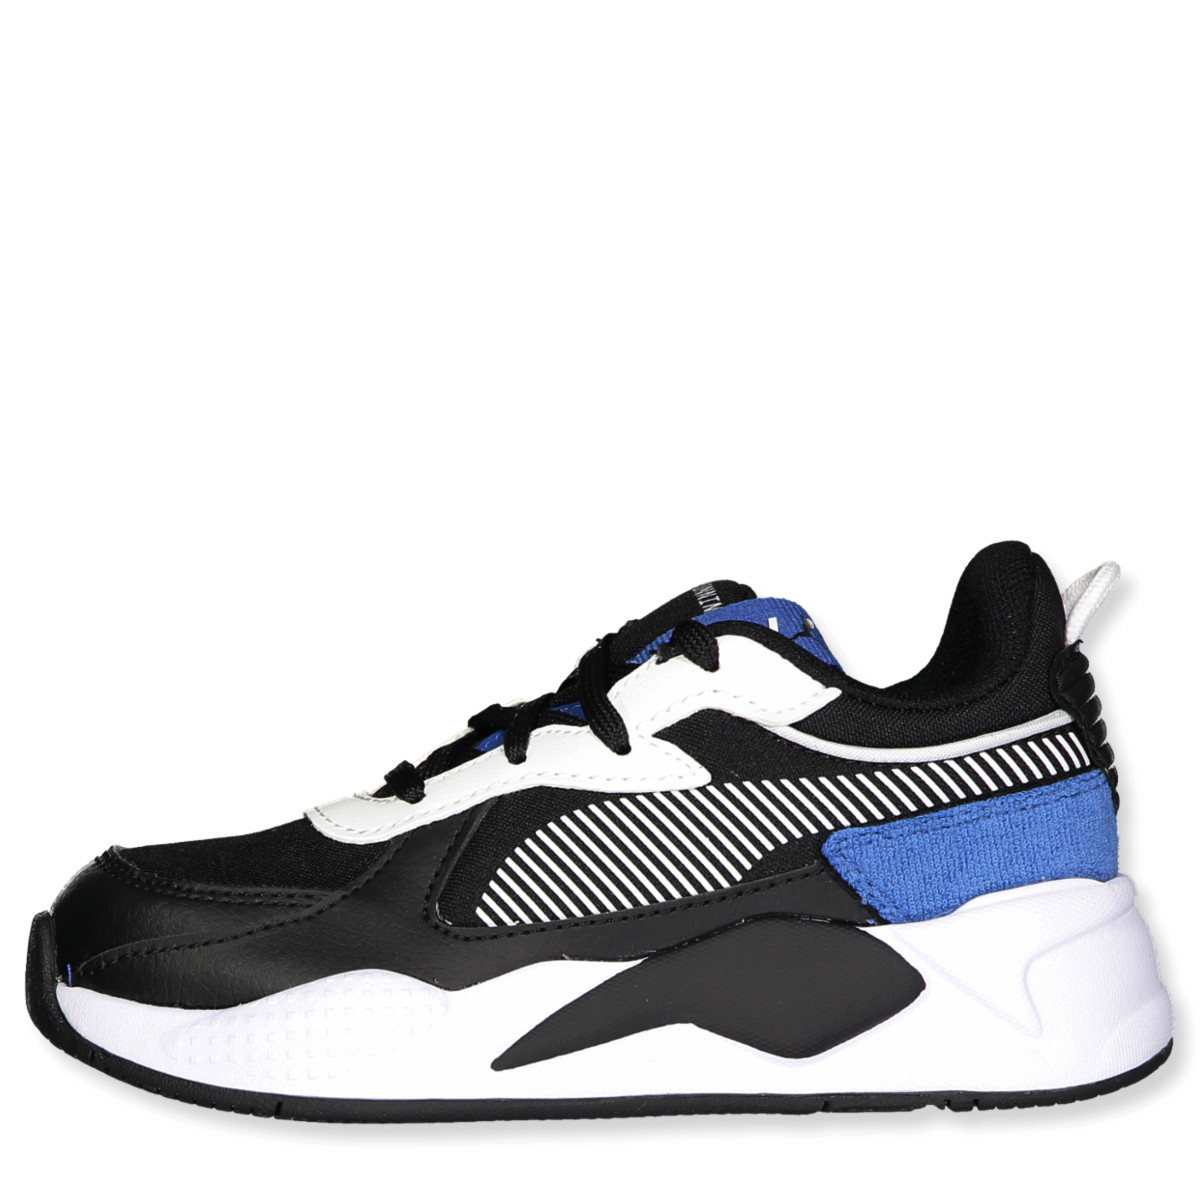 Adidas Haven Trainers Soft BlueBlack